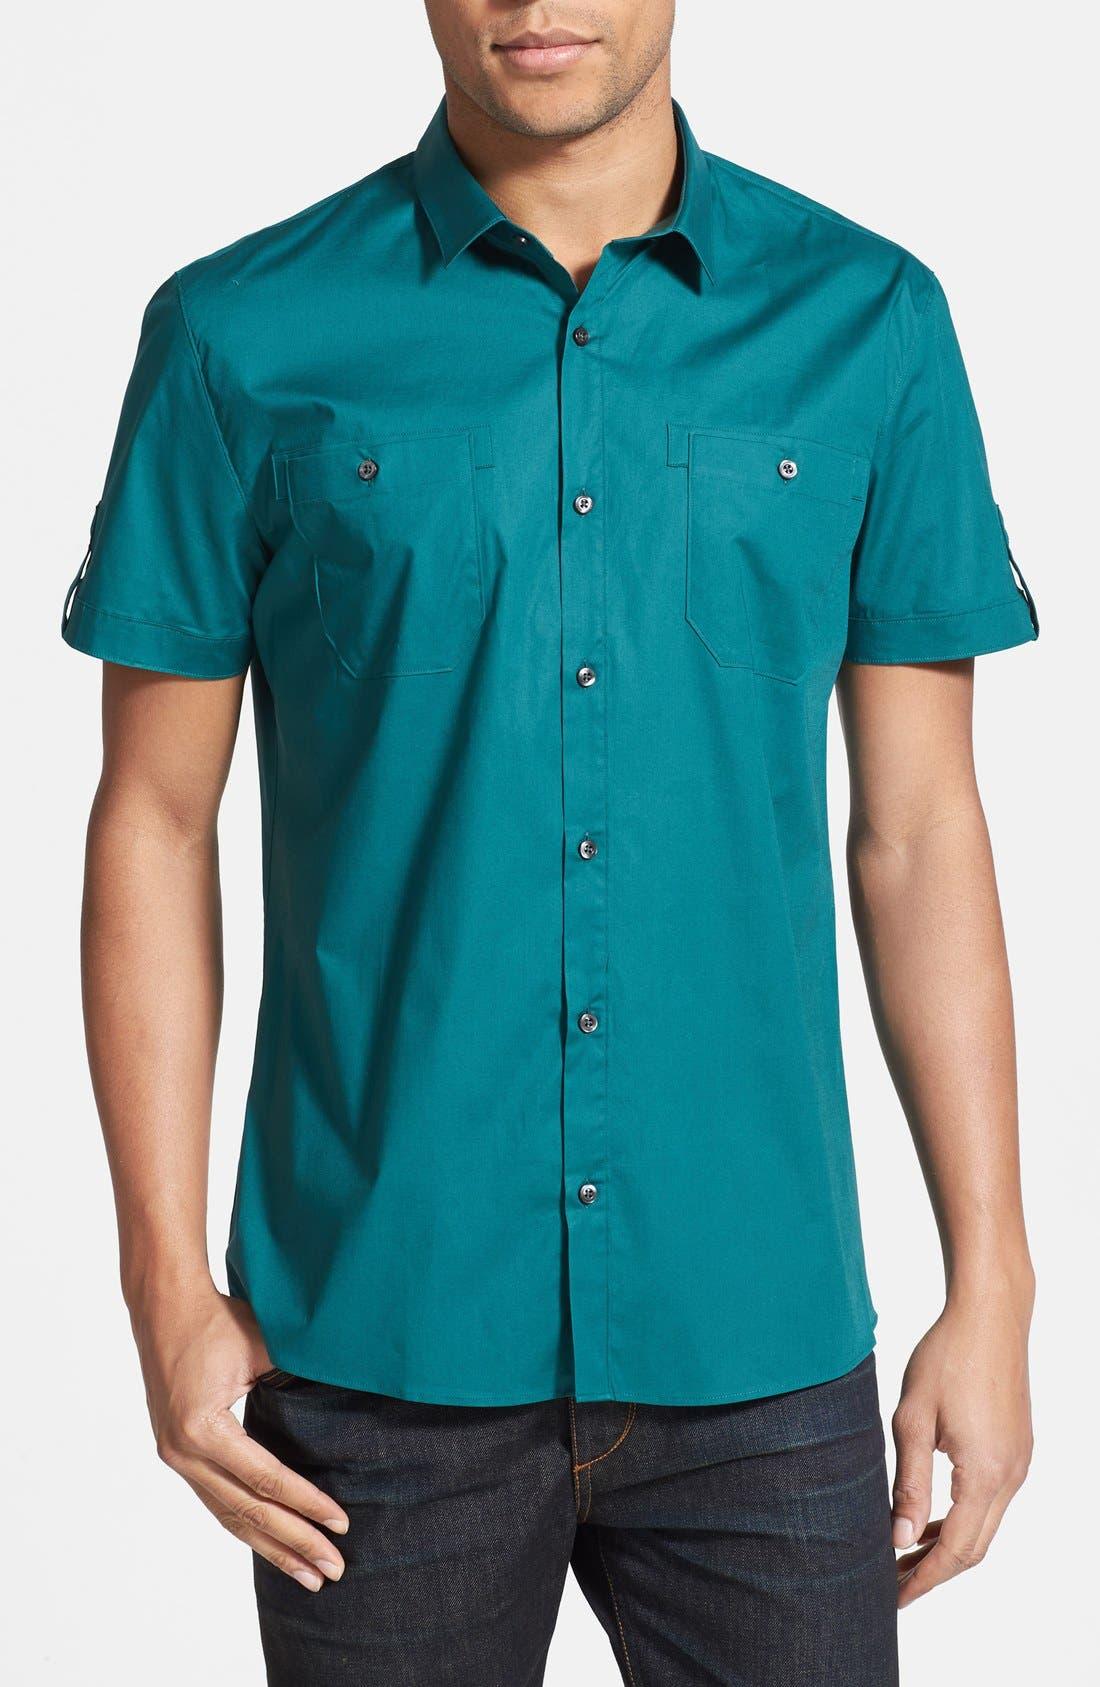 Alternate Image 1 Selected - HUGO Slim Fit Short Sleeve Woven Sport Shirt